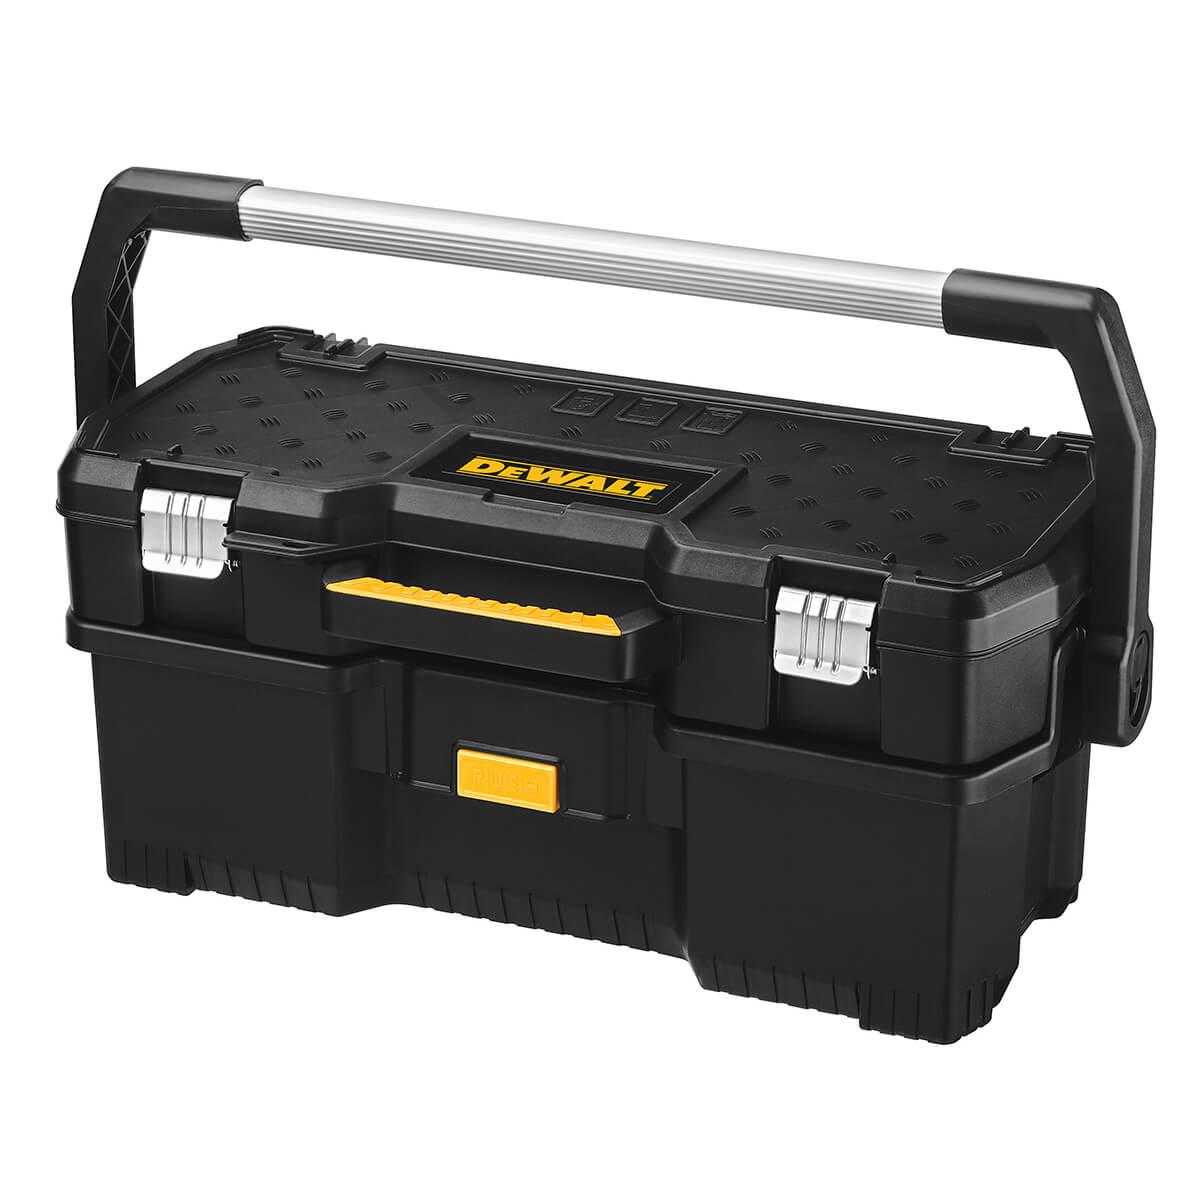 DEWALT 24-in Tool Box